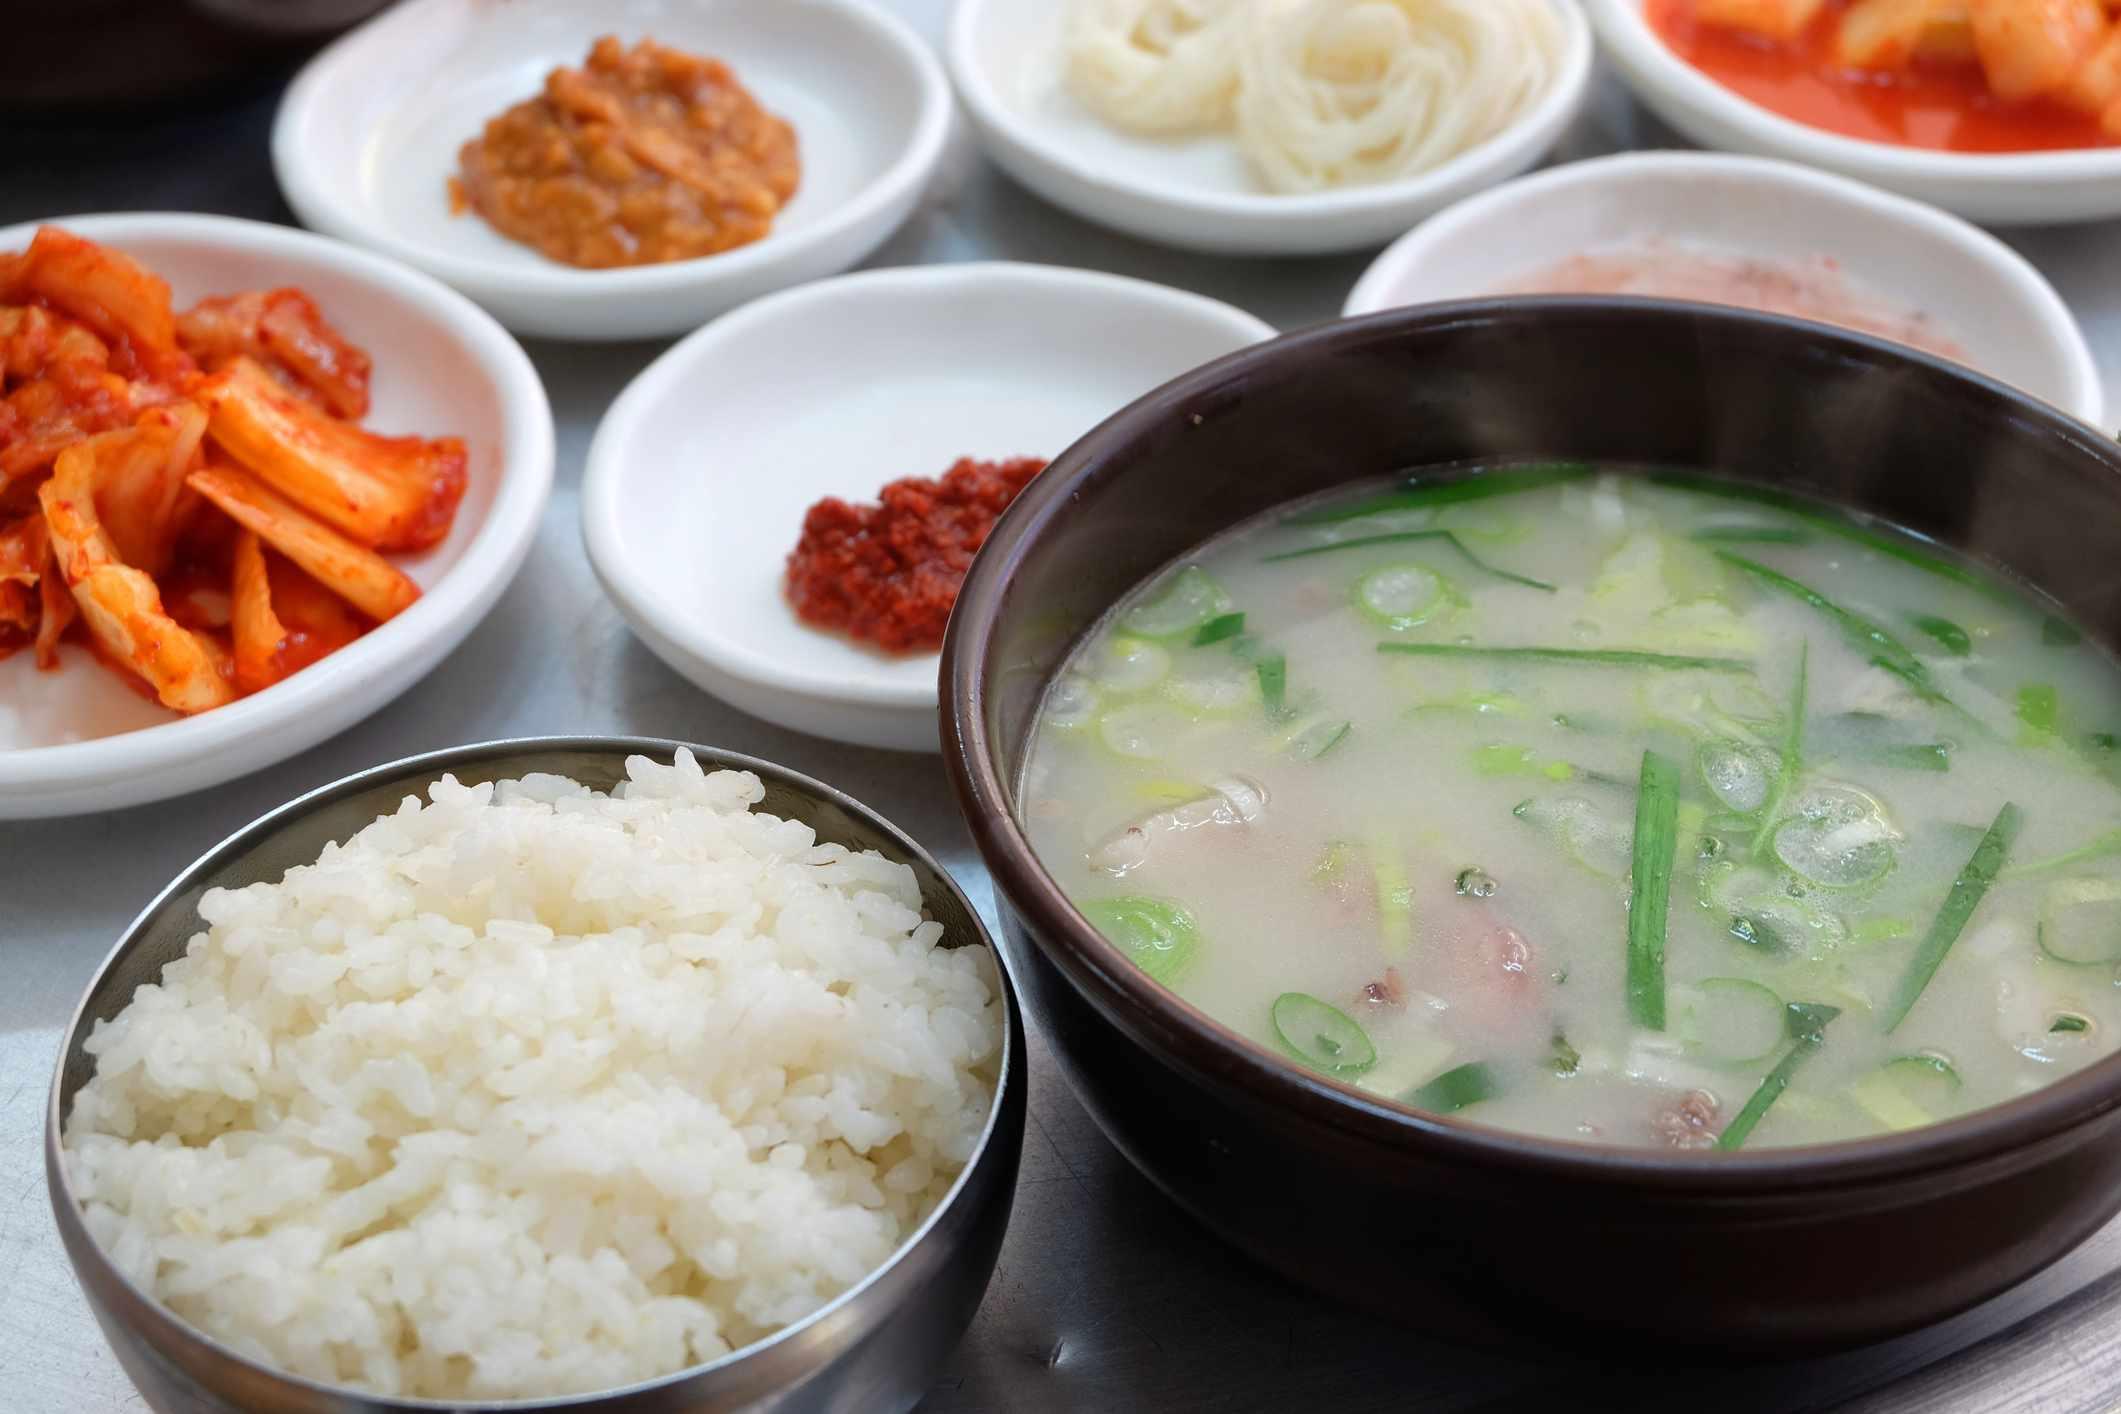 Korean food Dwaeji-gukbap. Rice and pork soup in a steaming stone bowl.